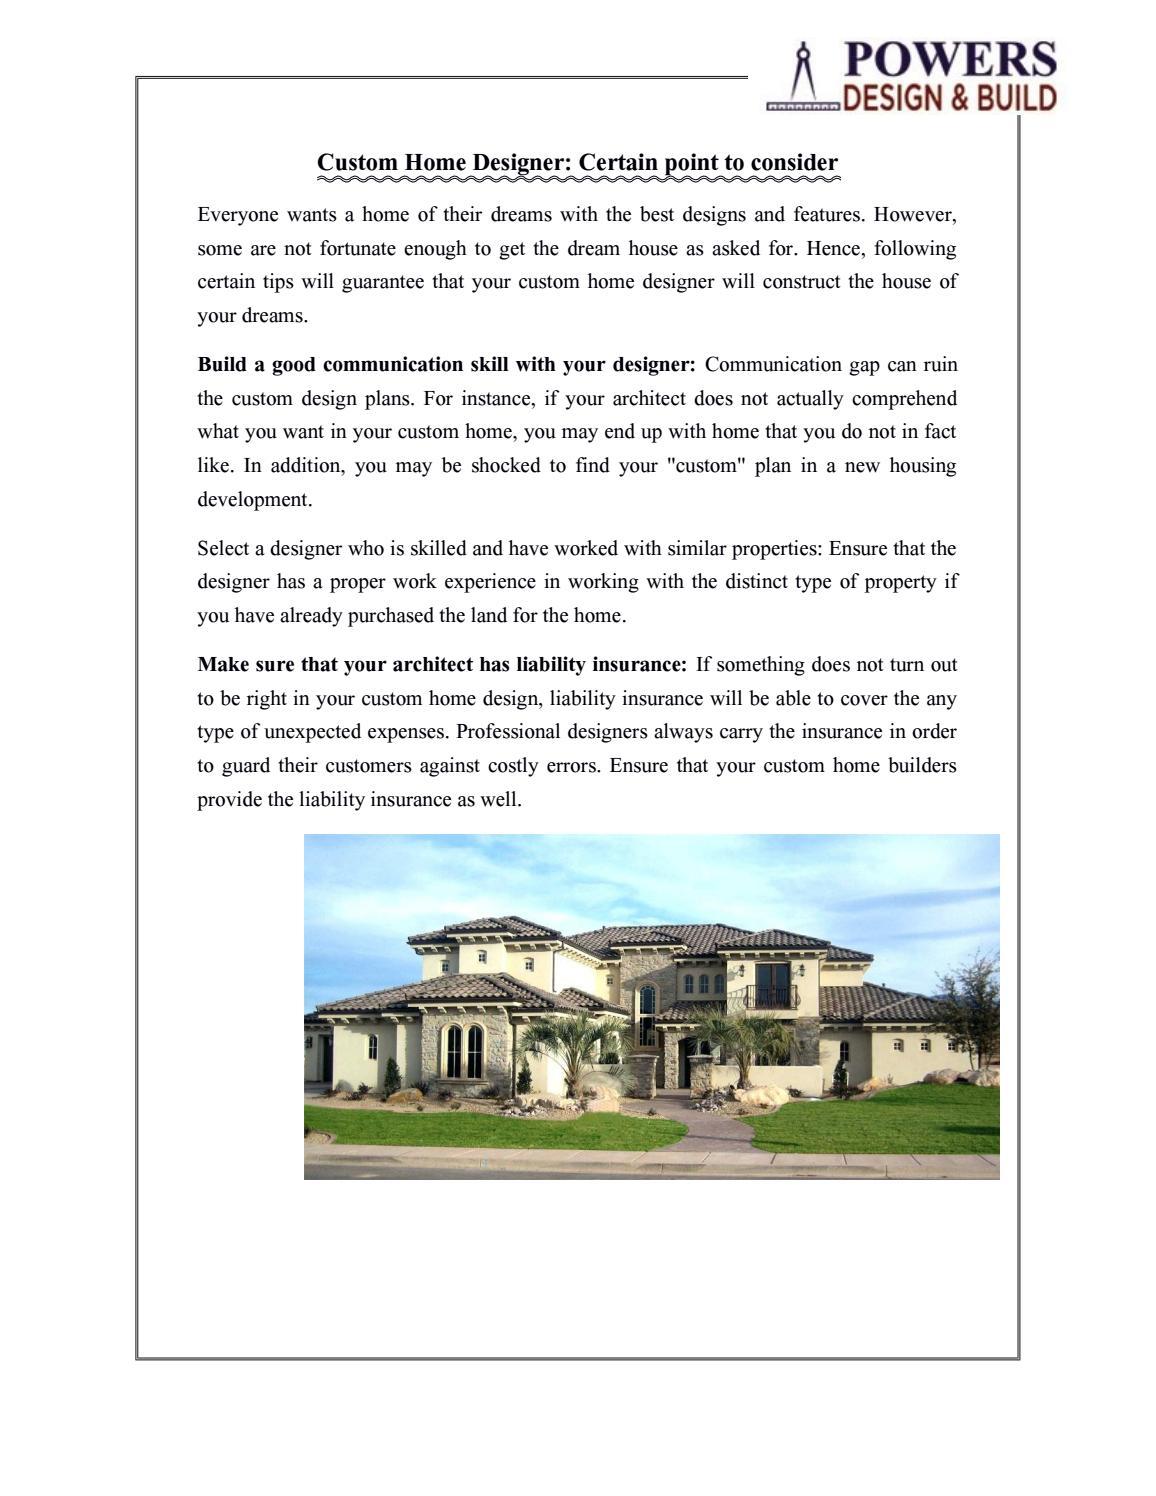 Custom Home Designer: Certain point to consider by Powers Design \u0026 Build LLC - issuu